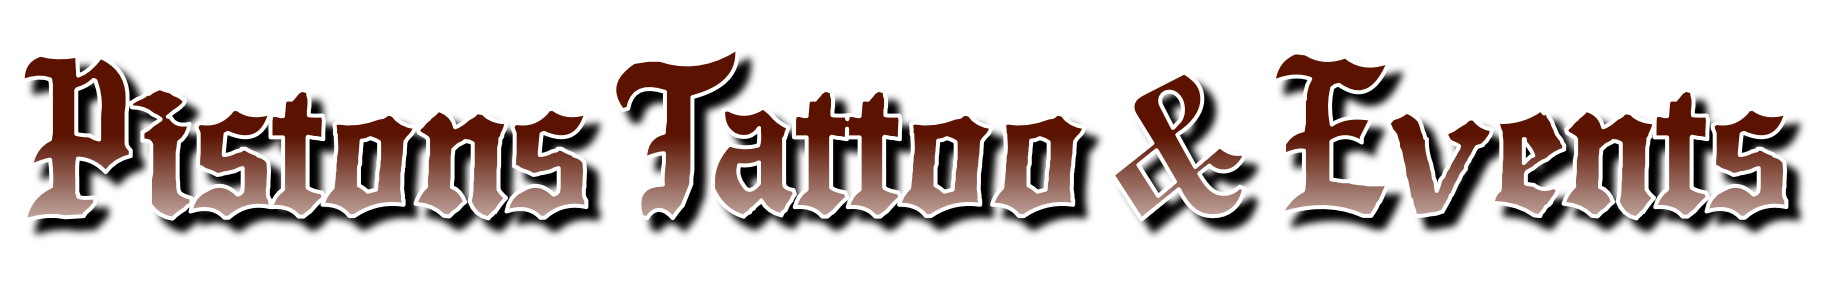 Pistons Tattoo & Event Service